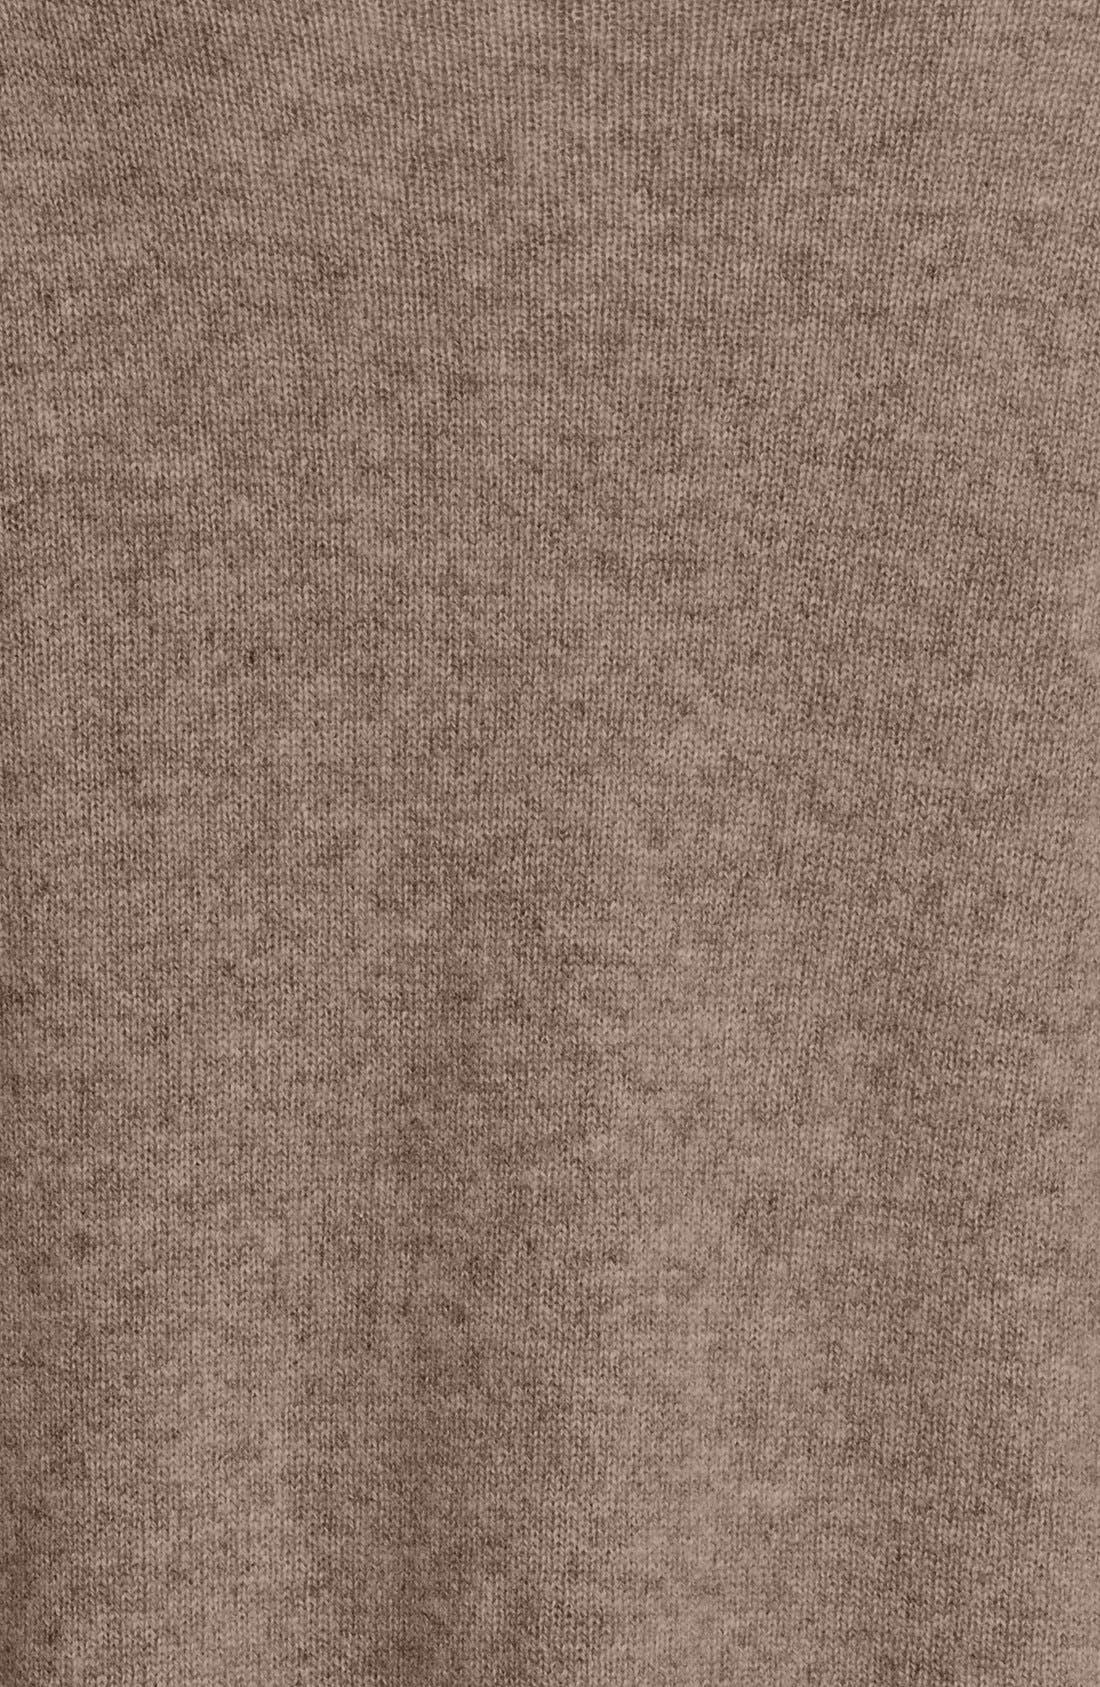 Alternate Image 3  - Joie 'Crush' Cashmere Sweater